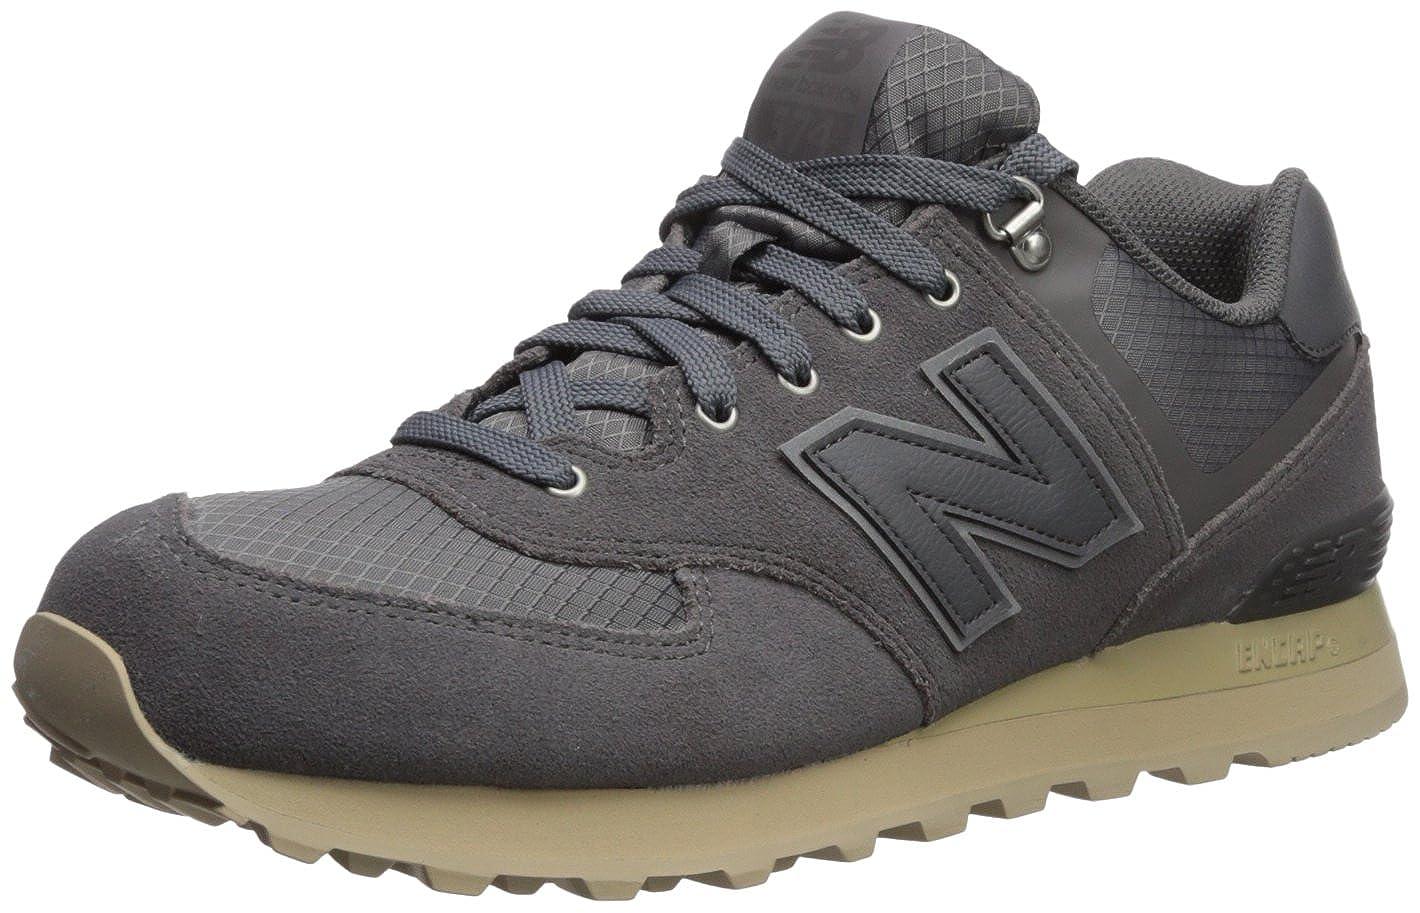 cbee263eb2bc7 New Balance Men's 574 Trainers: Amazon.co.uk: Shoes & Bags